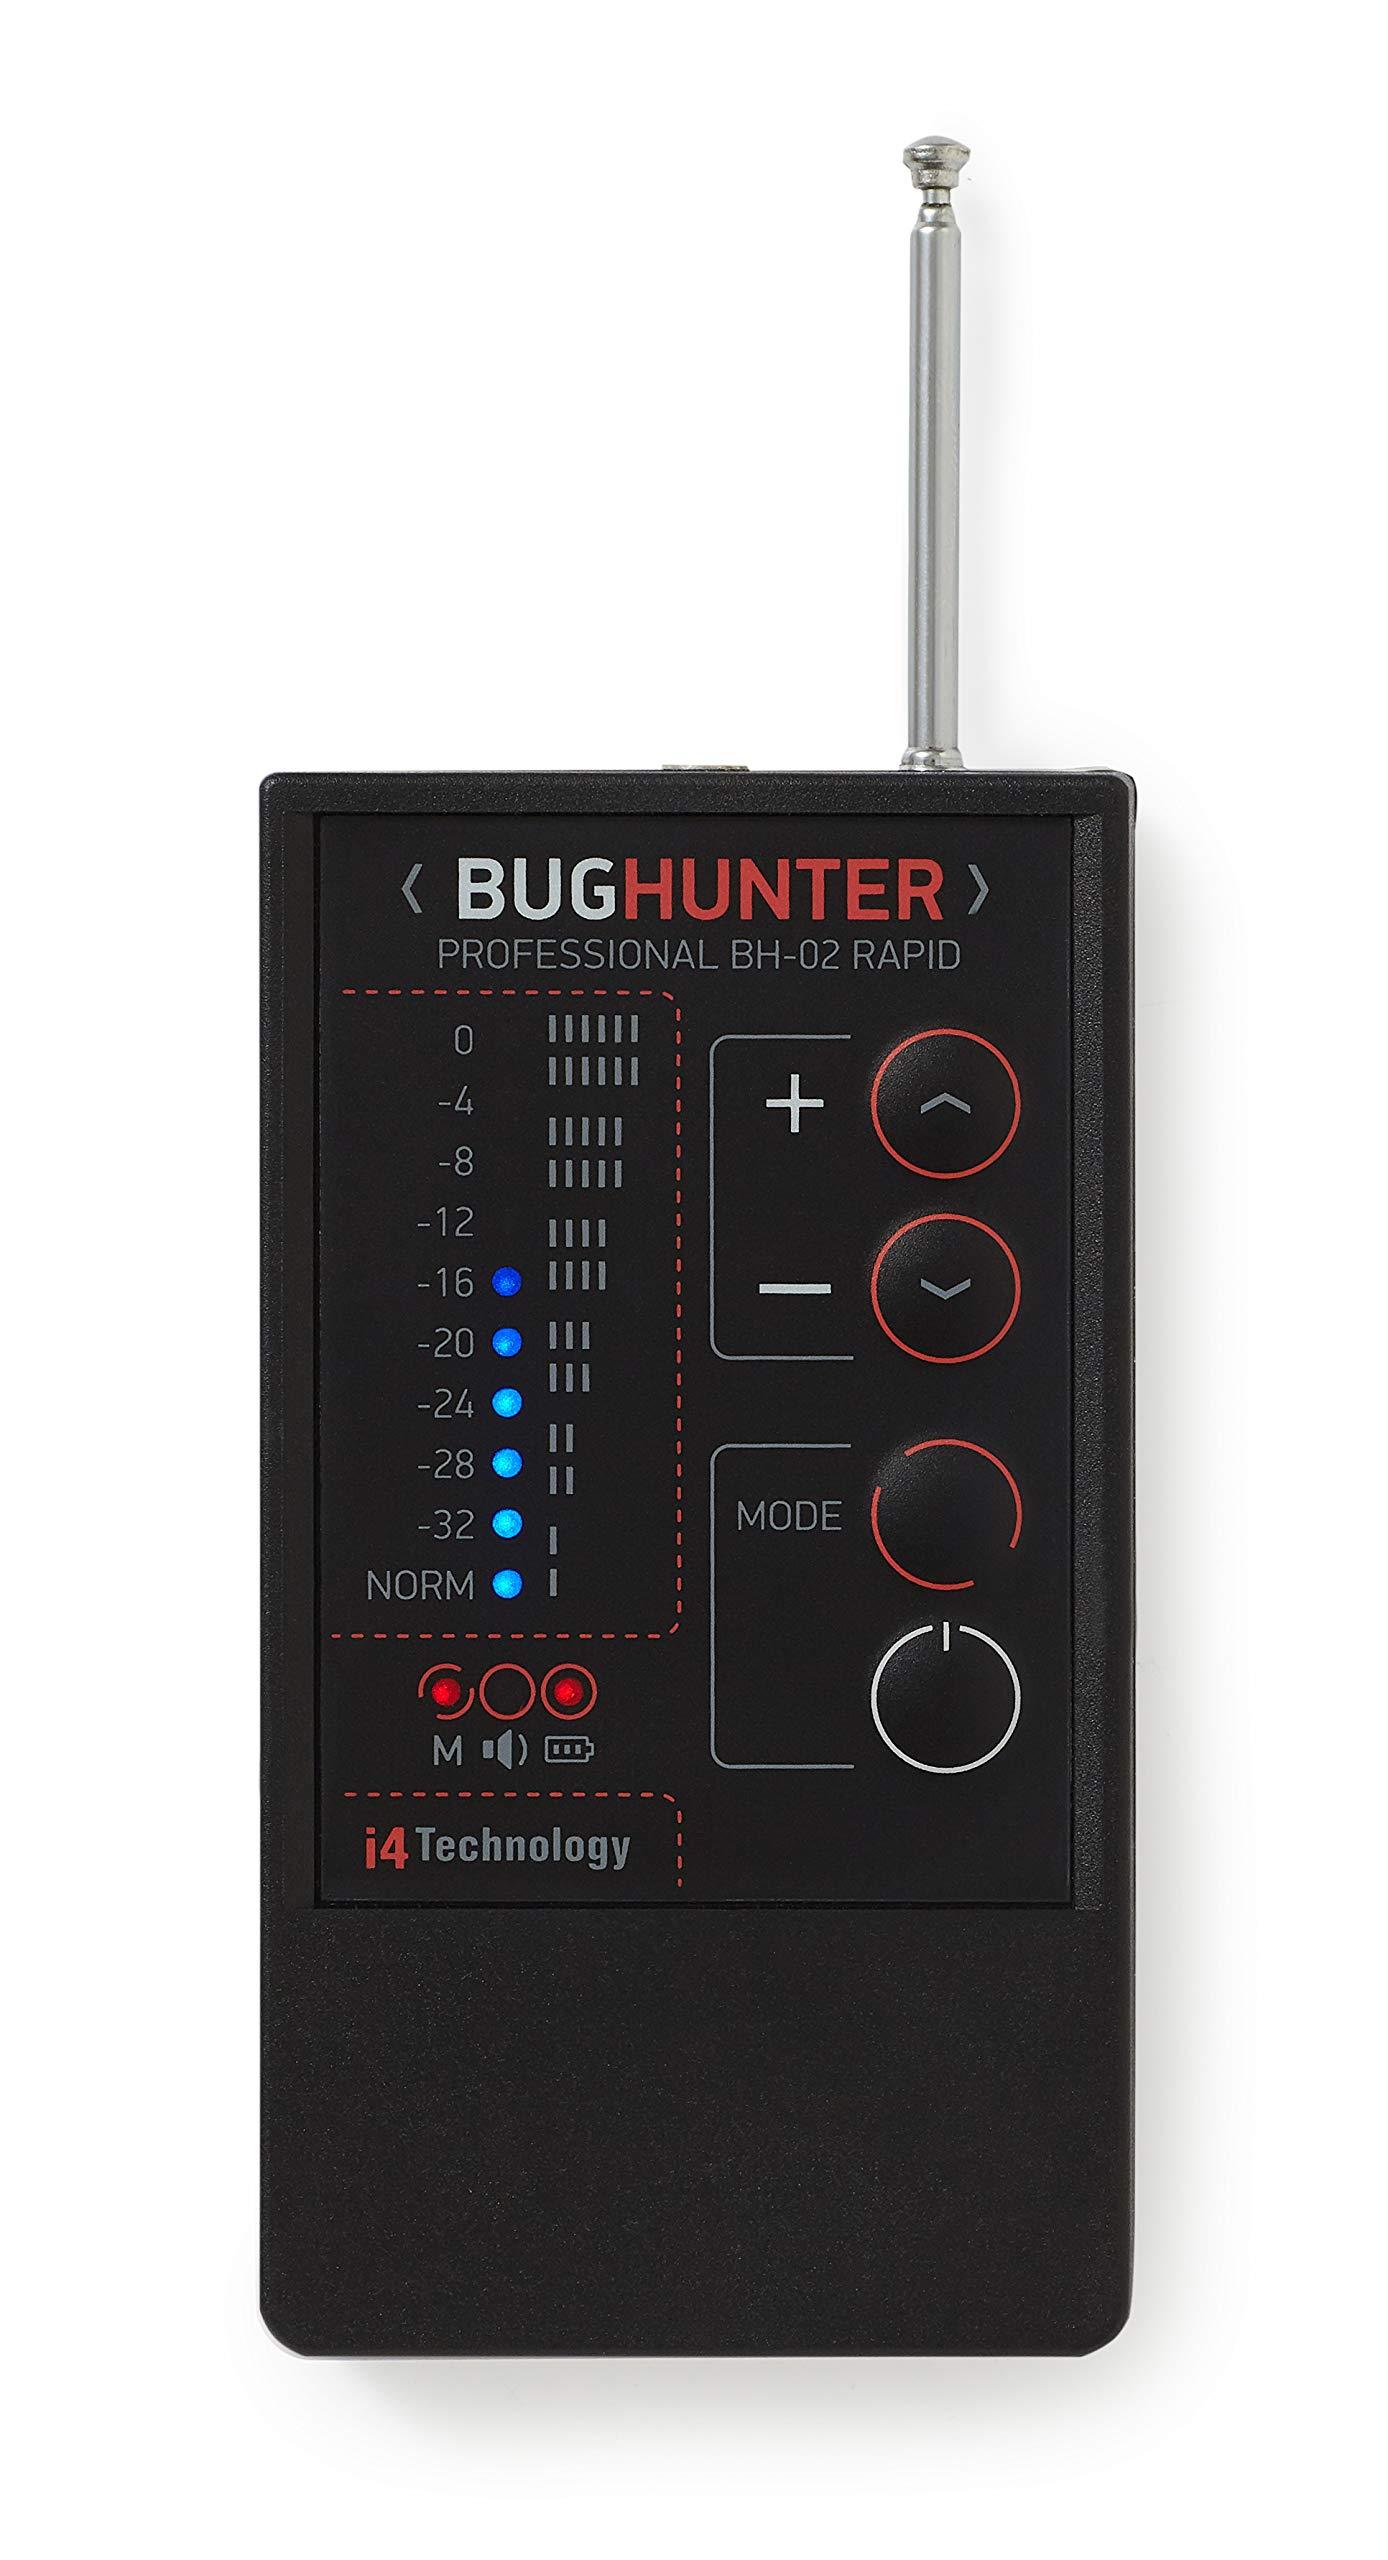 Anti Spy Bug Hidden Camera Microphone Detector Signal Detector Bug Hunter BH-02 Rapid